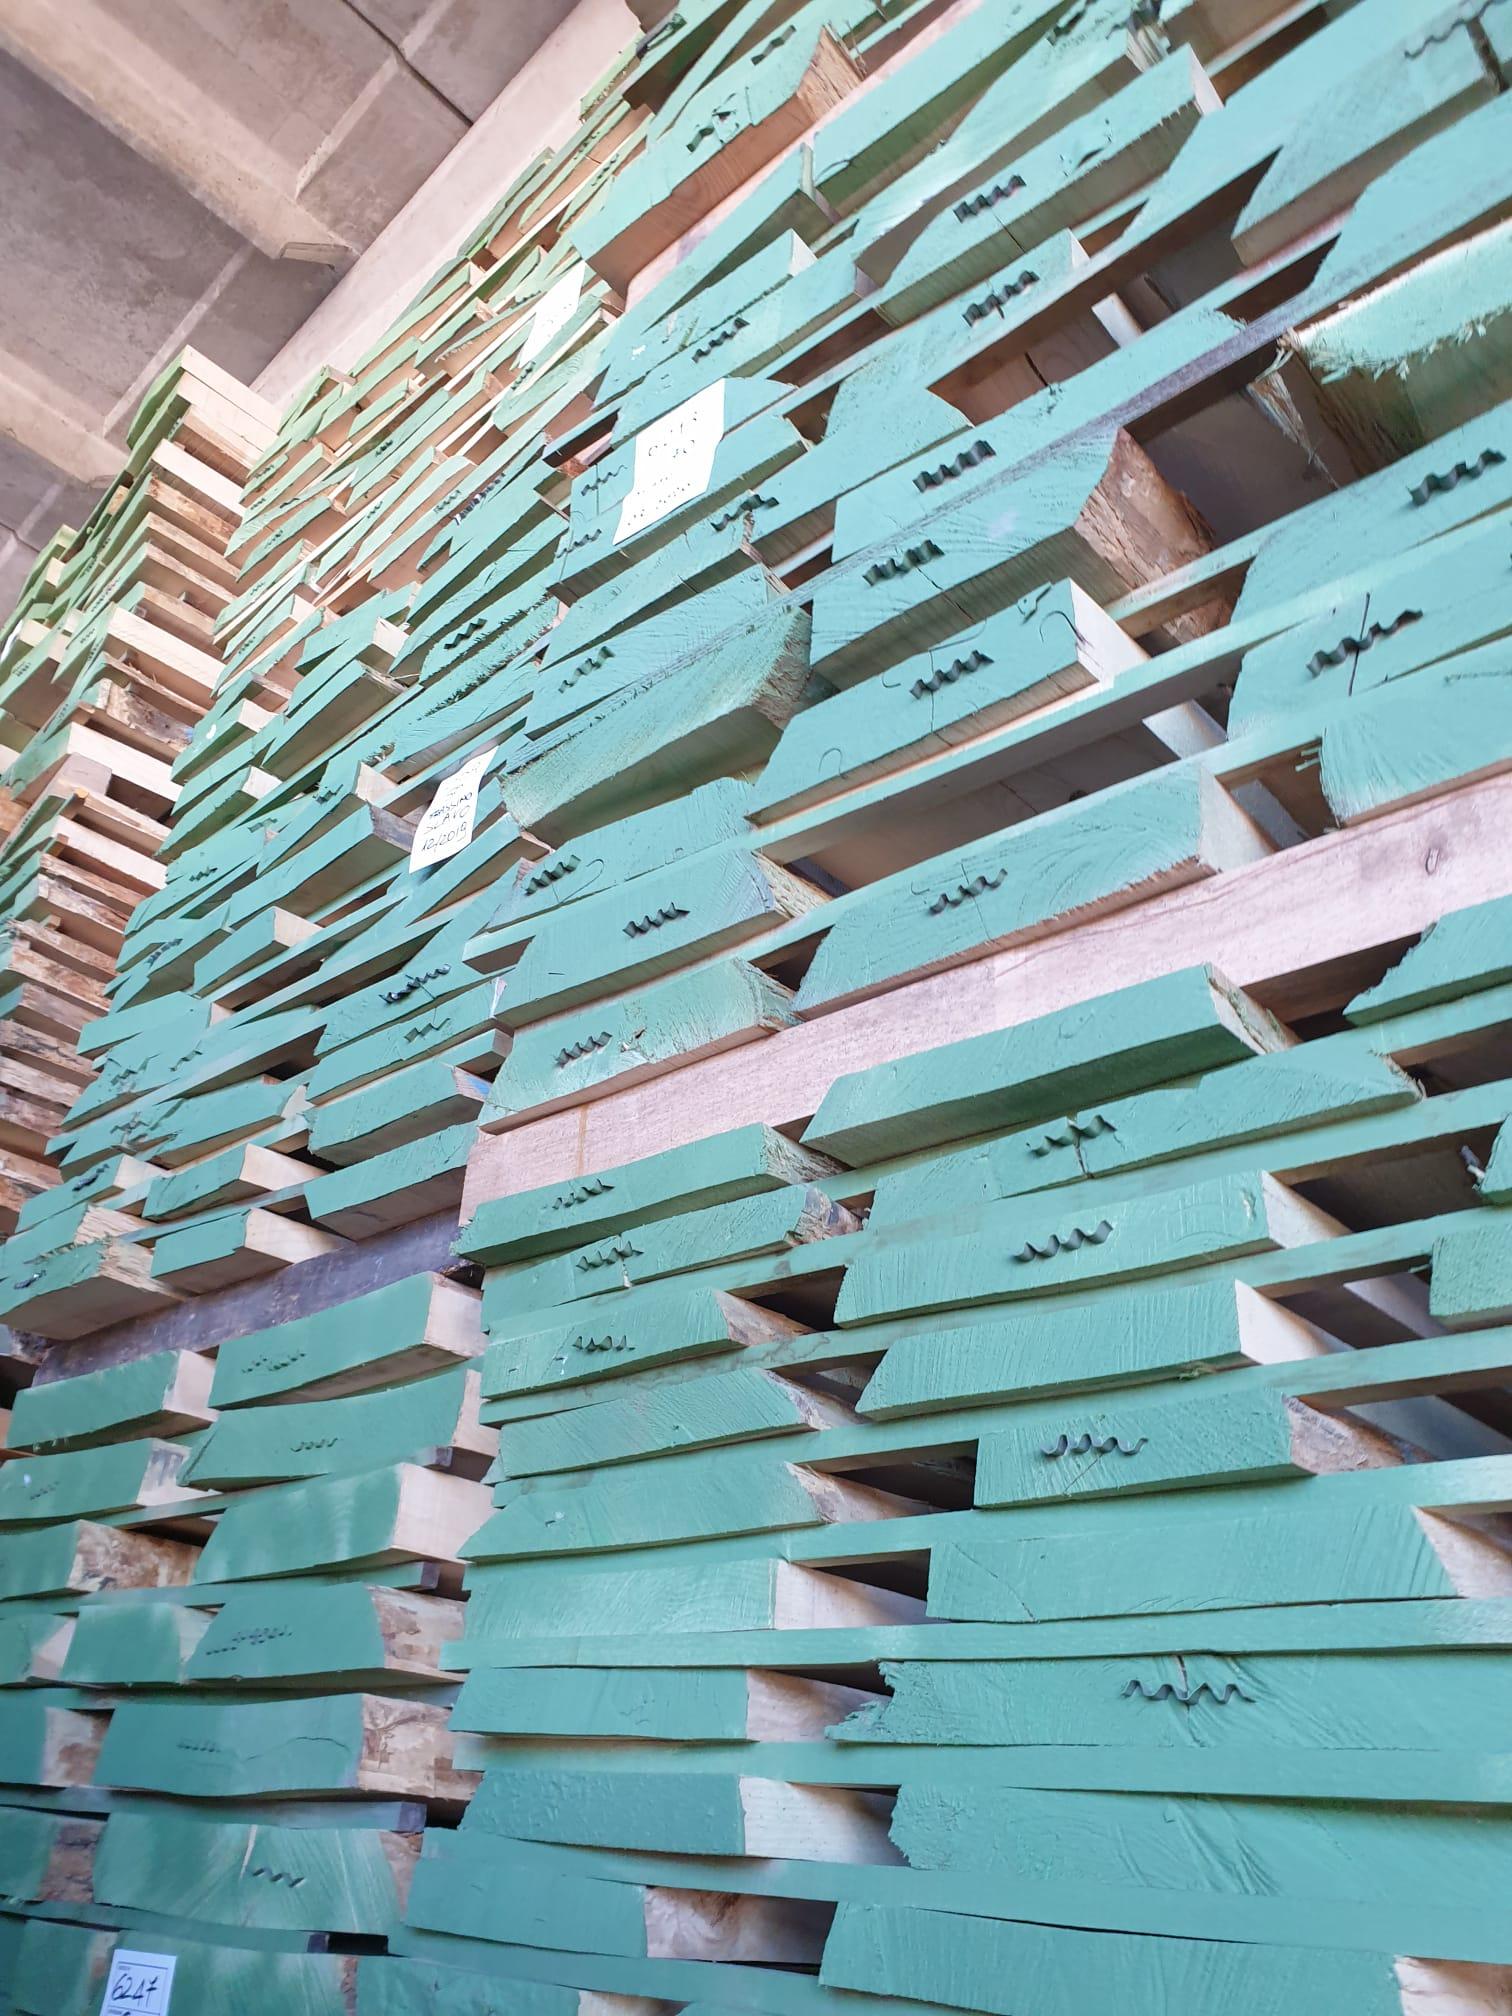 Frassino slavo tavolame - sp 40 50 60 70 80 100 - netto da nodi - per falegnameria